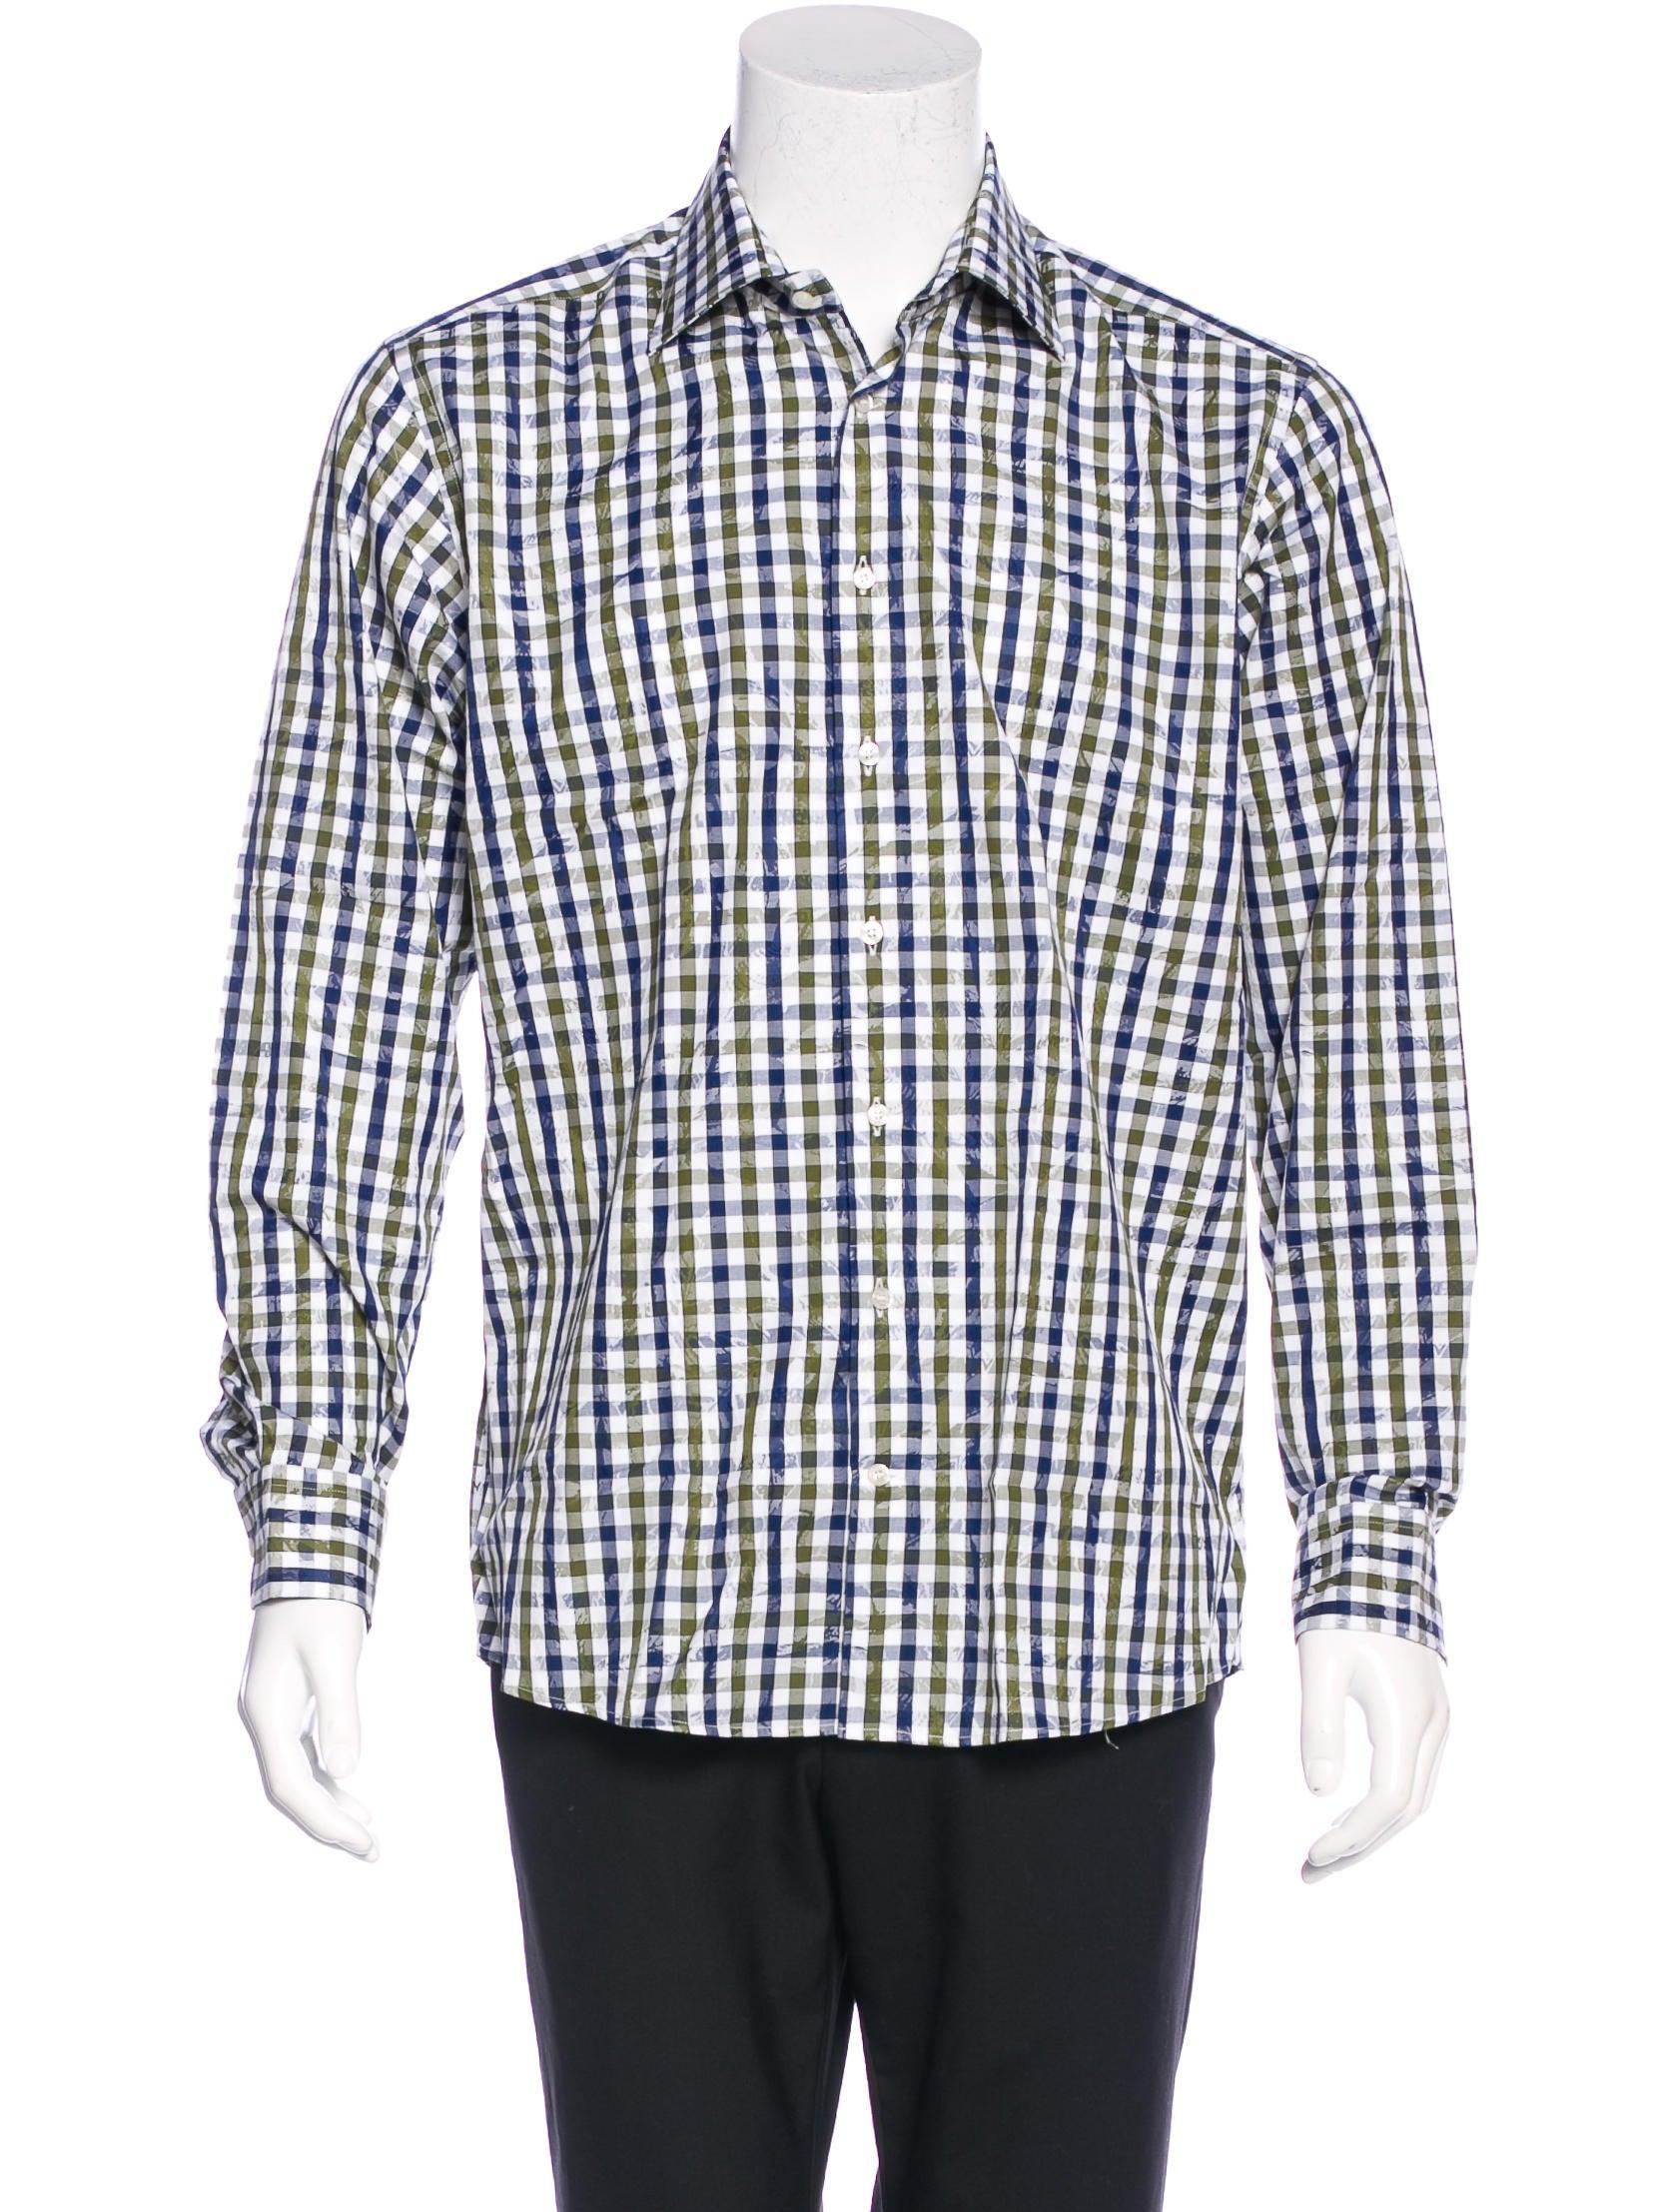 Etro gingham dress shirt w tags clothing etr43322 for Gingham dress shirt men